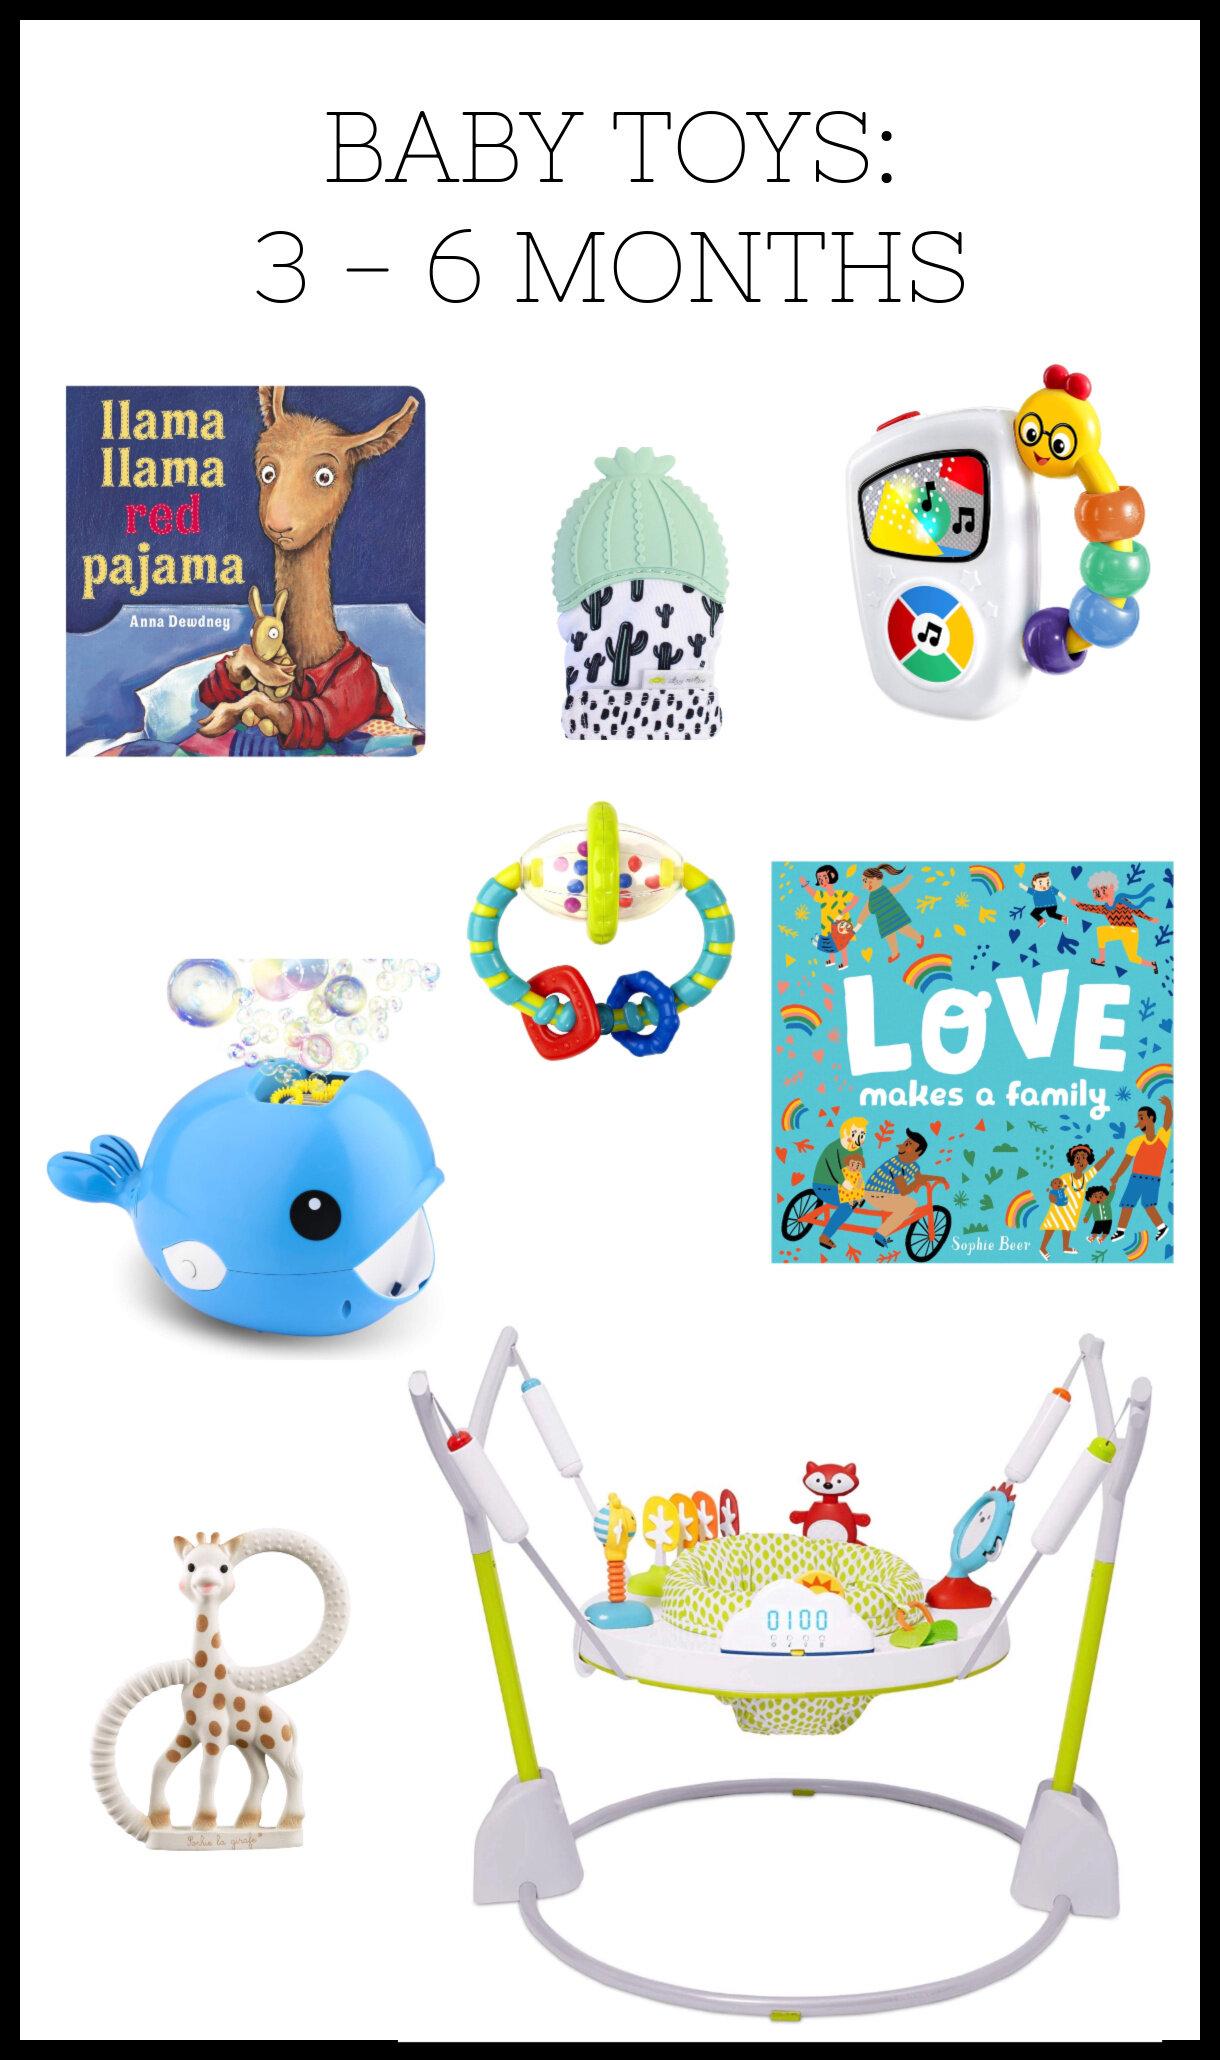 Baby Toys 3-6 Months.jpg